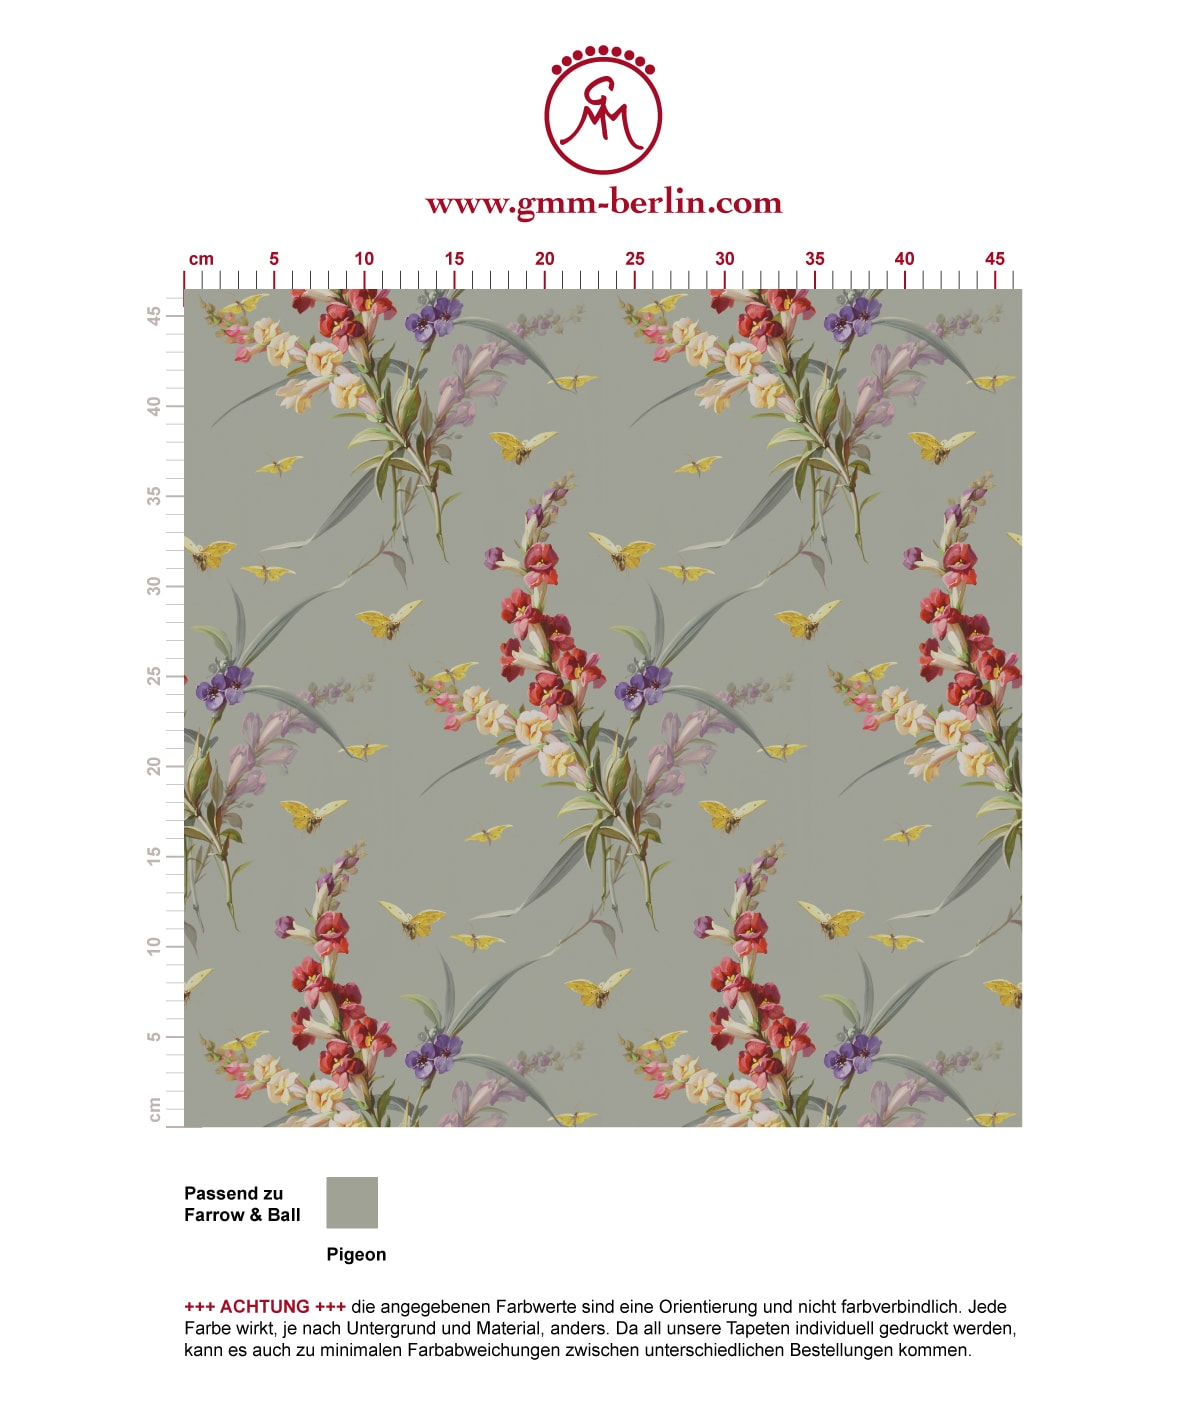 "Vintage Blüten Tapete ""Blissful Spring"" mit Schmetterlingen auf grau angepasst an Farrow and Ball Wandfarben- Vliestapete Blumen 3"